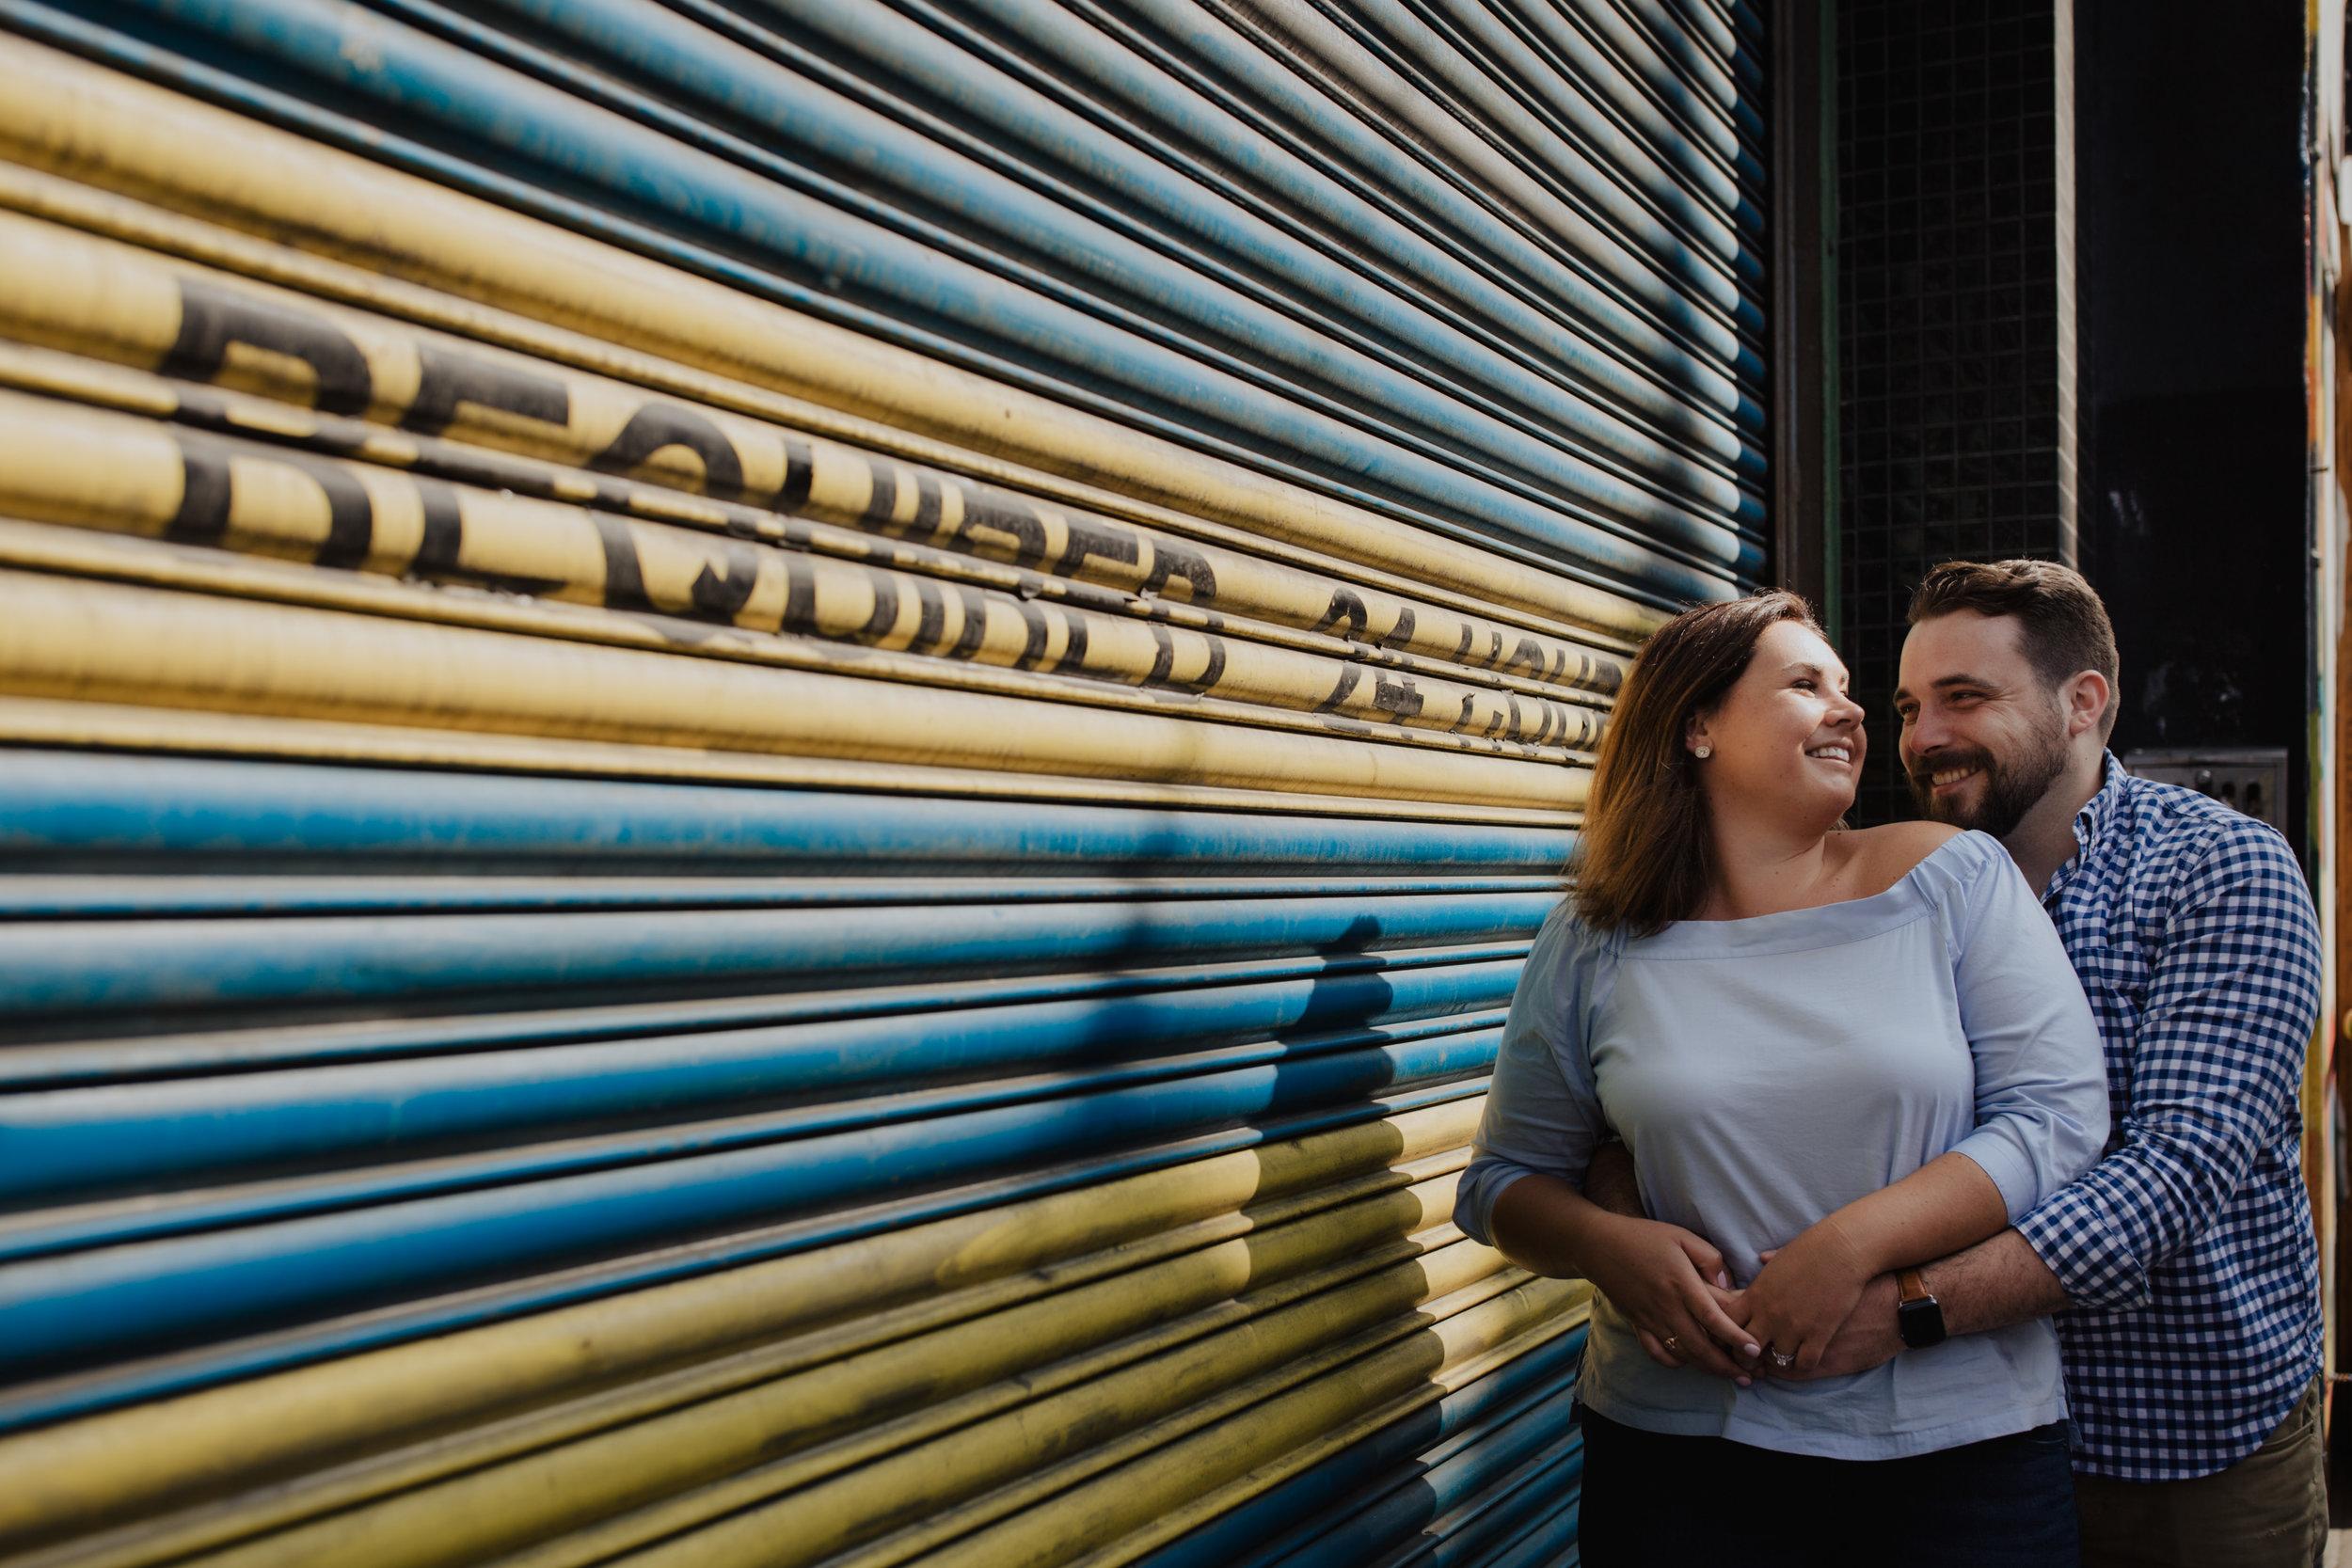 c&c_dublin_city_engagement_photos_livia_figueiredo_ireland_wedding_photographer_5.jpg